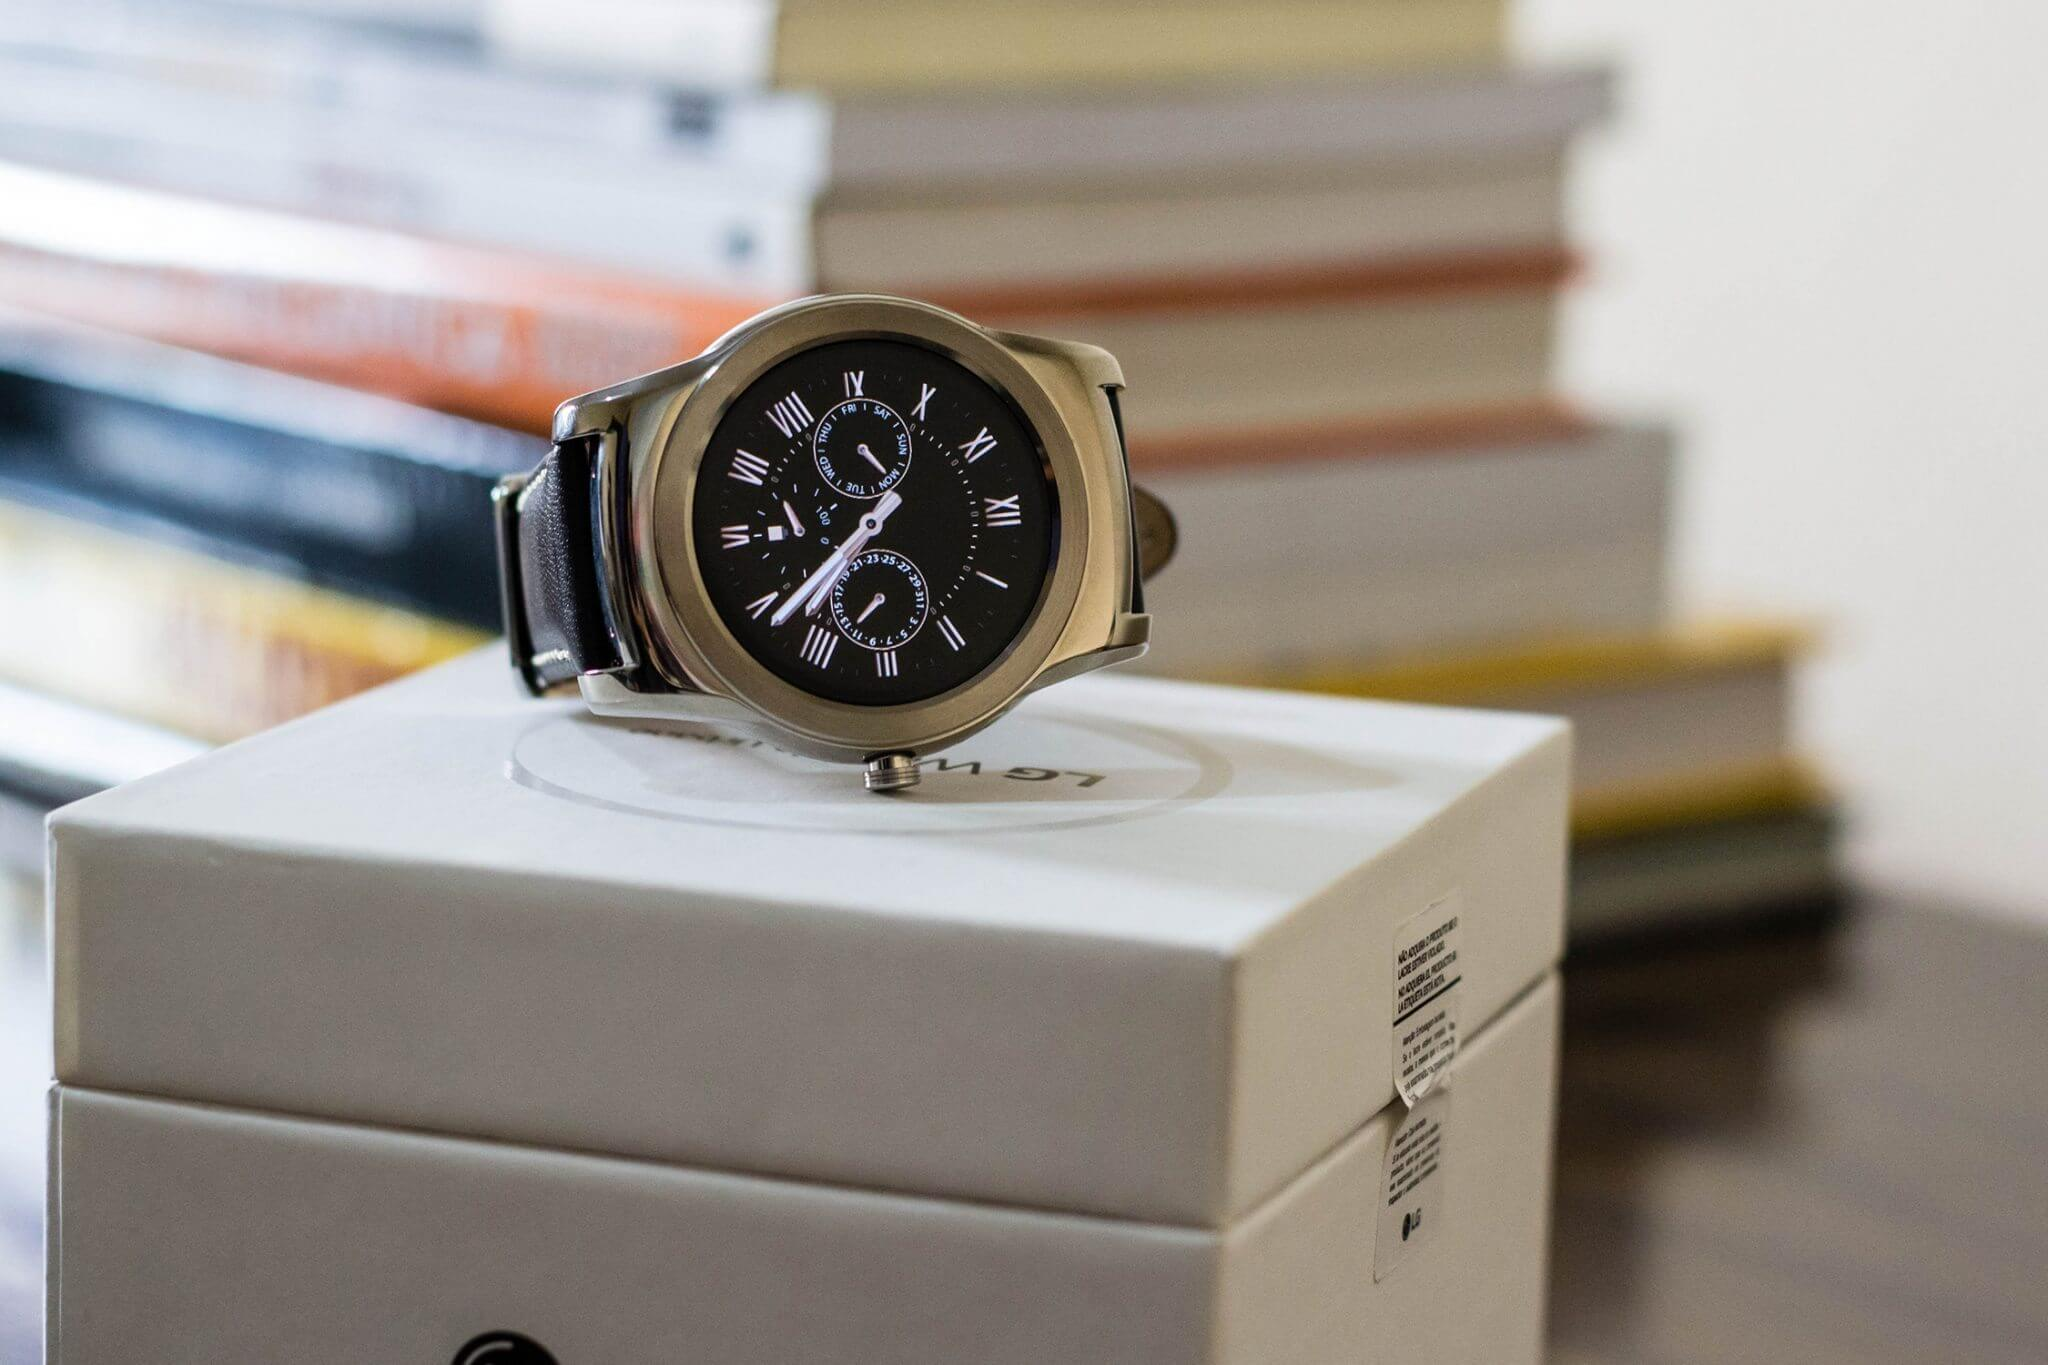 LG-Watch-Urbane_0005_IMG_4109